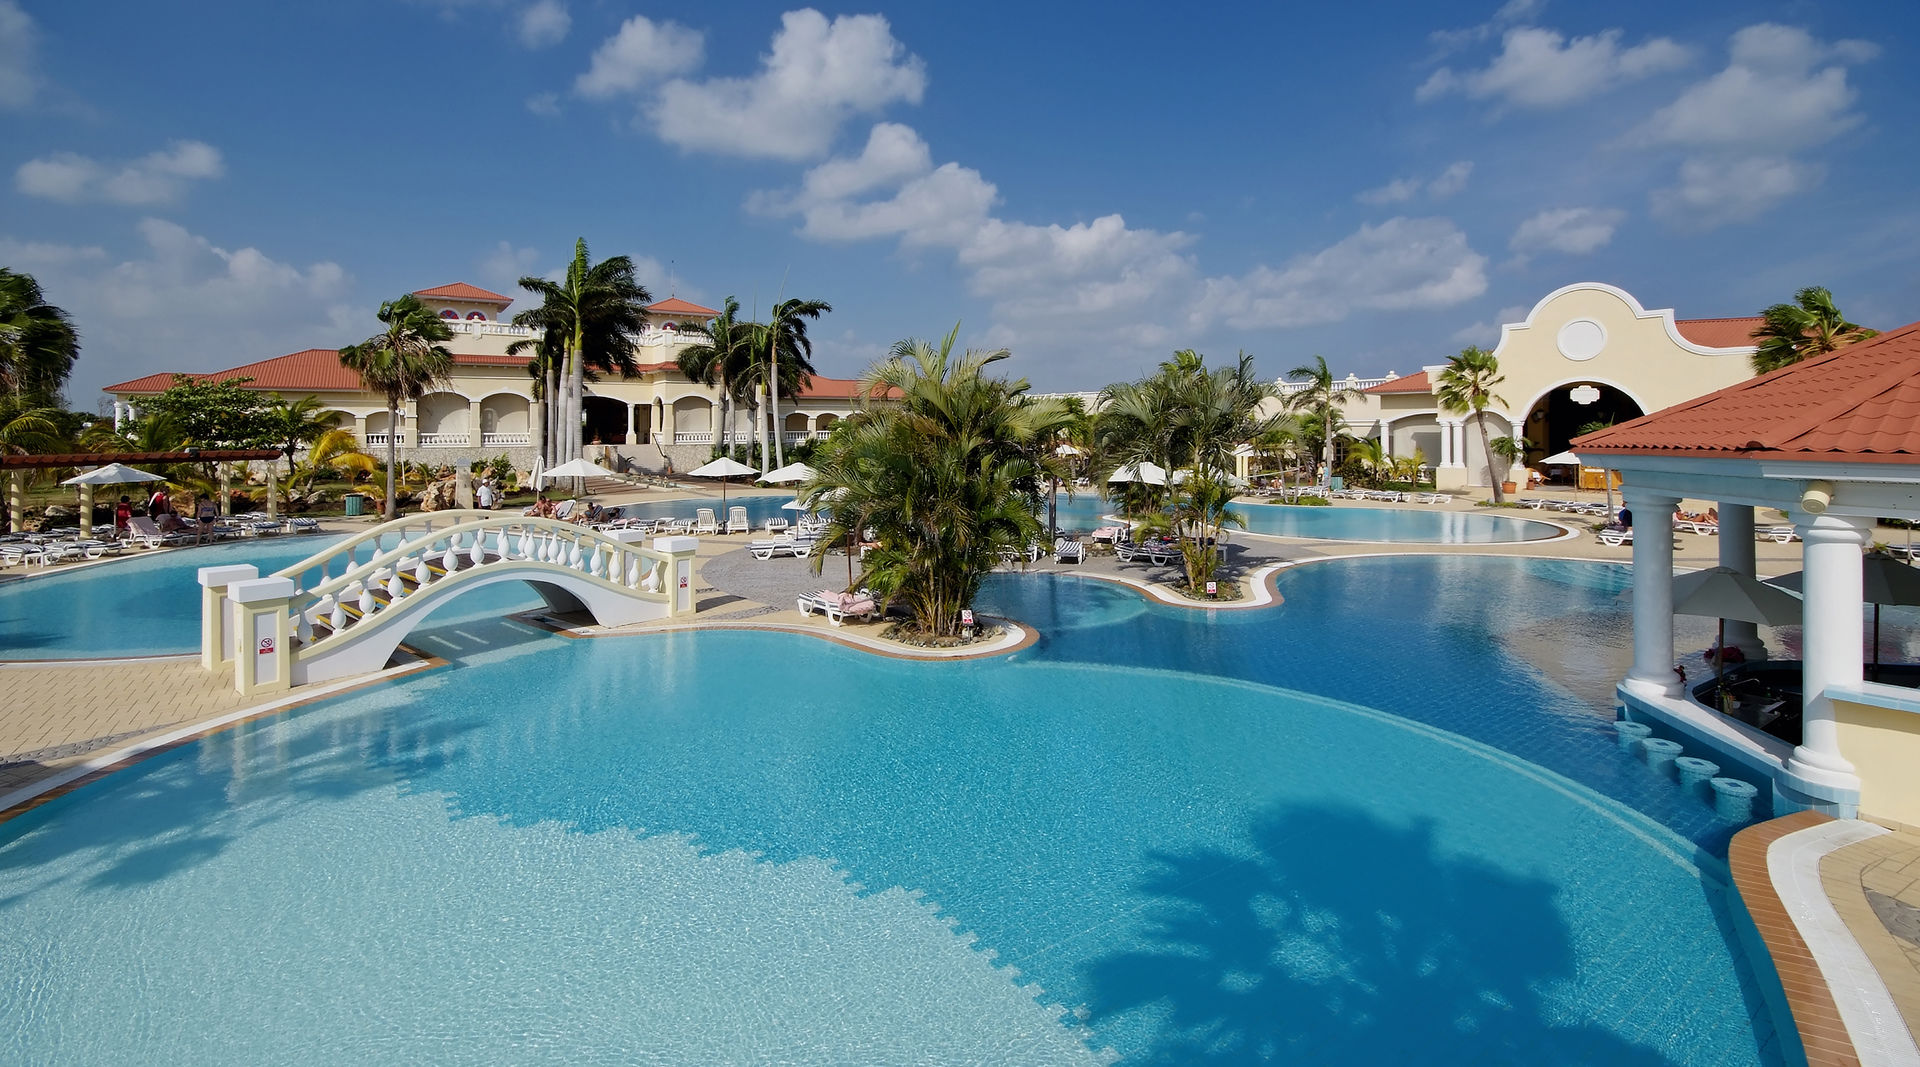 paradisus-princesadelmar-piscina-10548